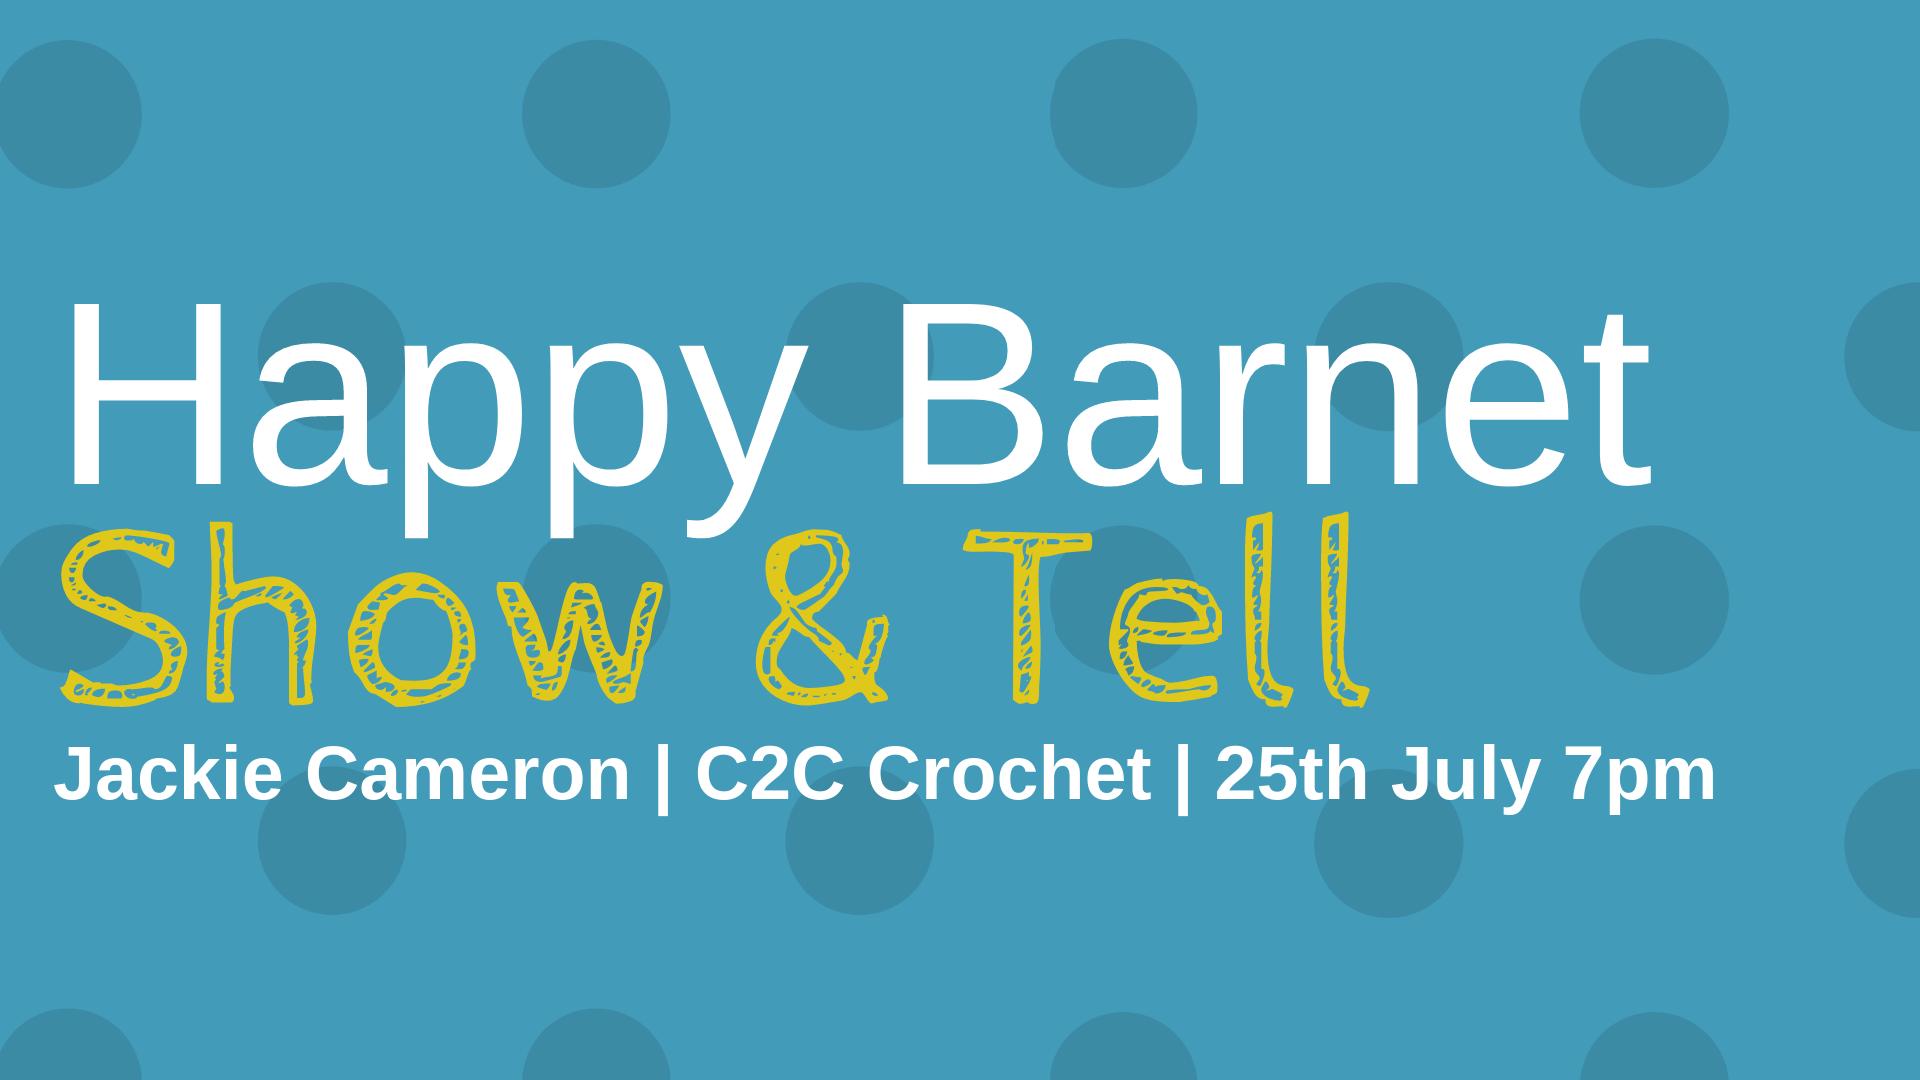 happy barnet craft demo c2c crochet